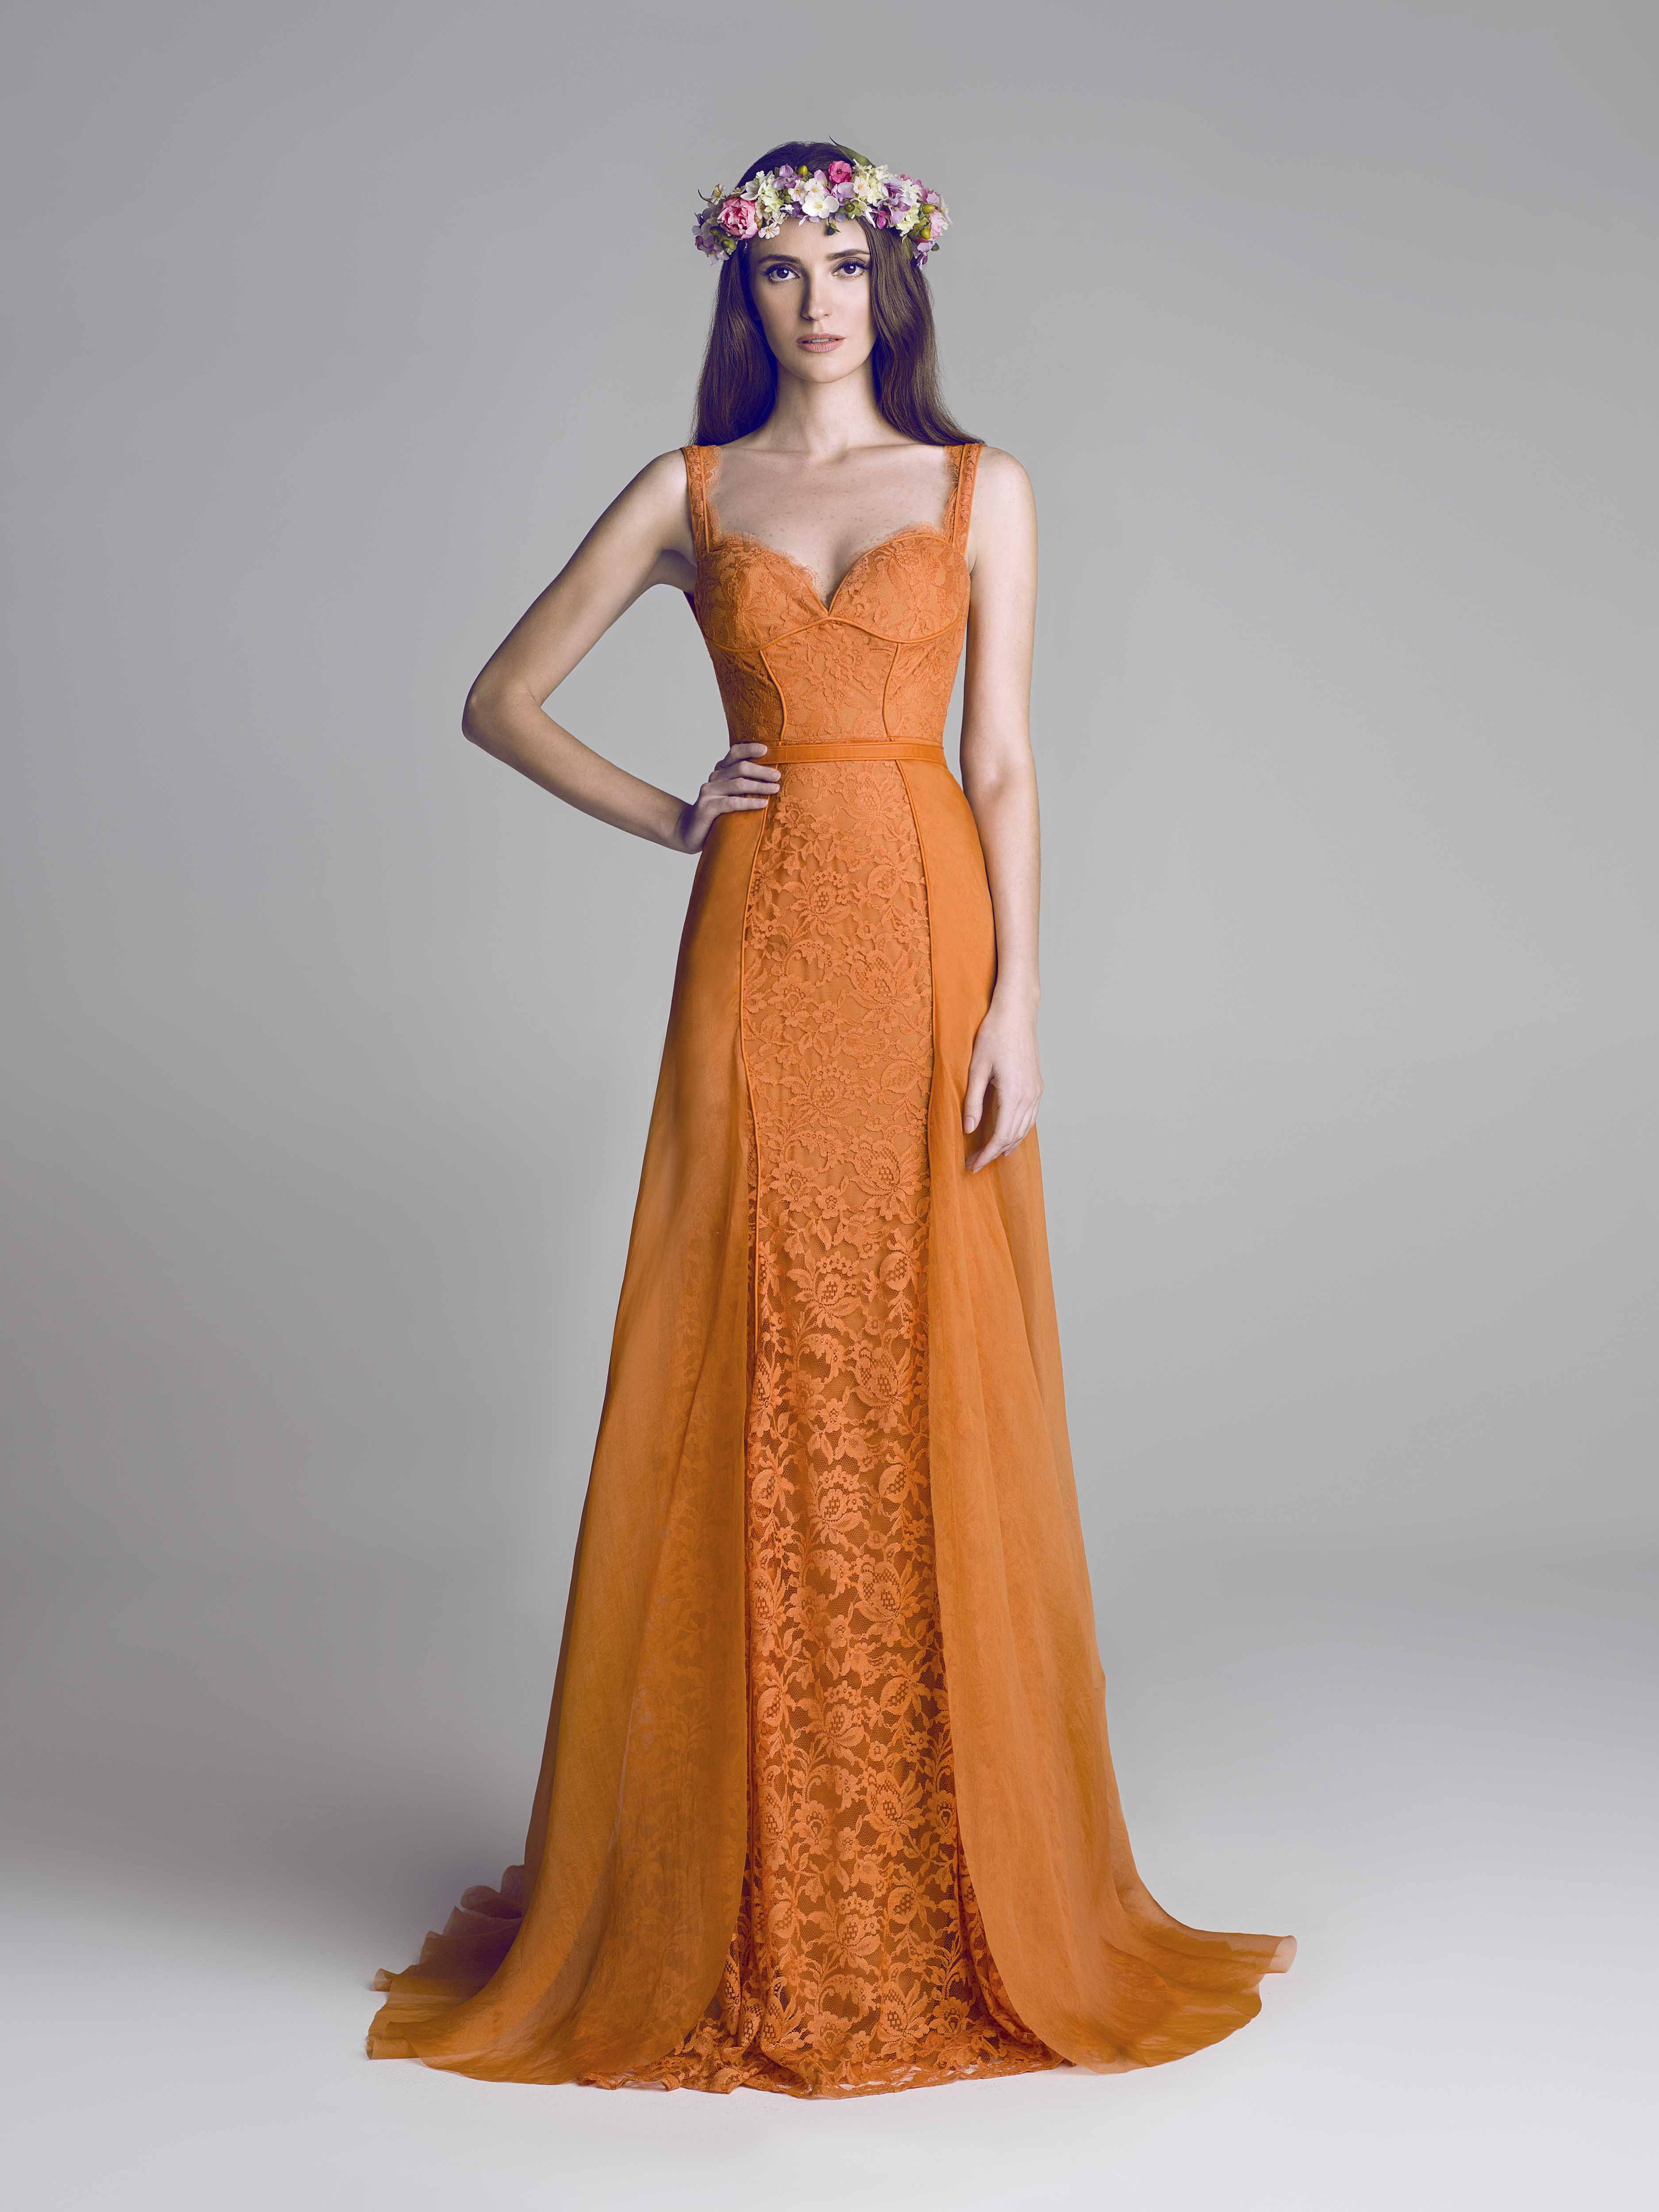 Orange lace dress   Deco casa   Pinterest   Lace dress, Gowns and Prom